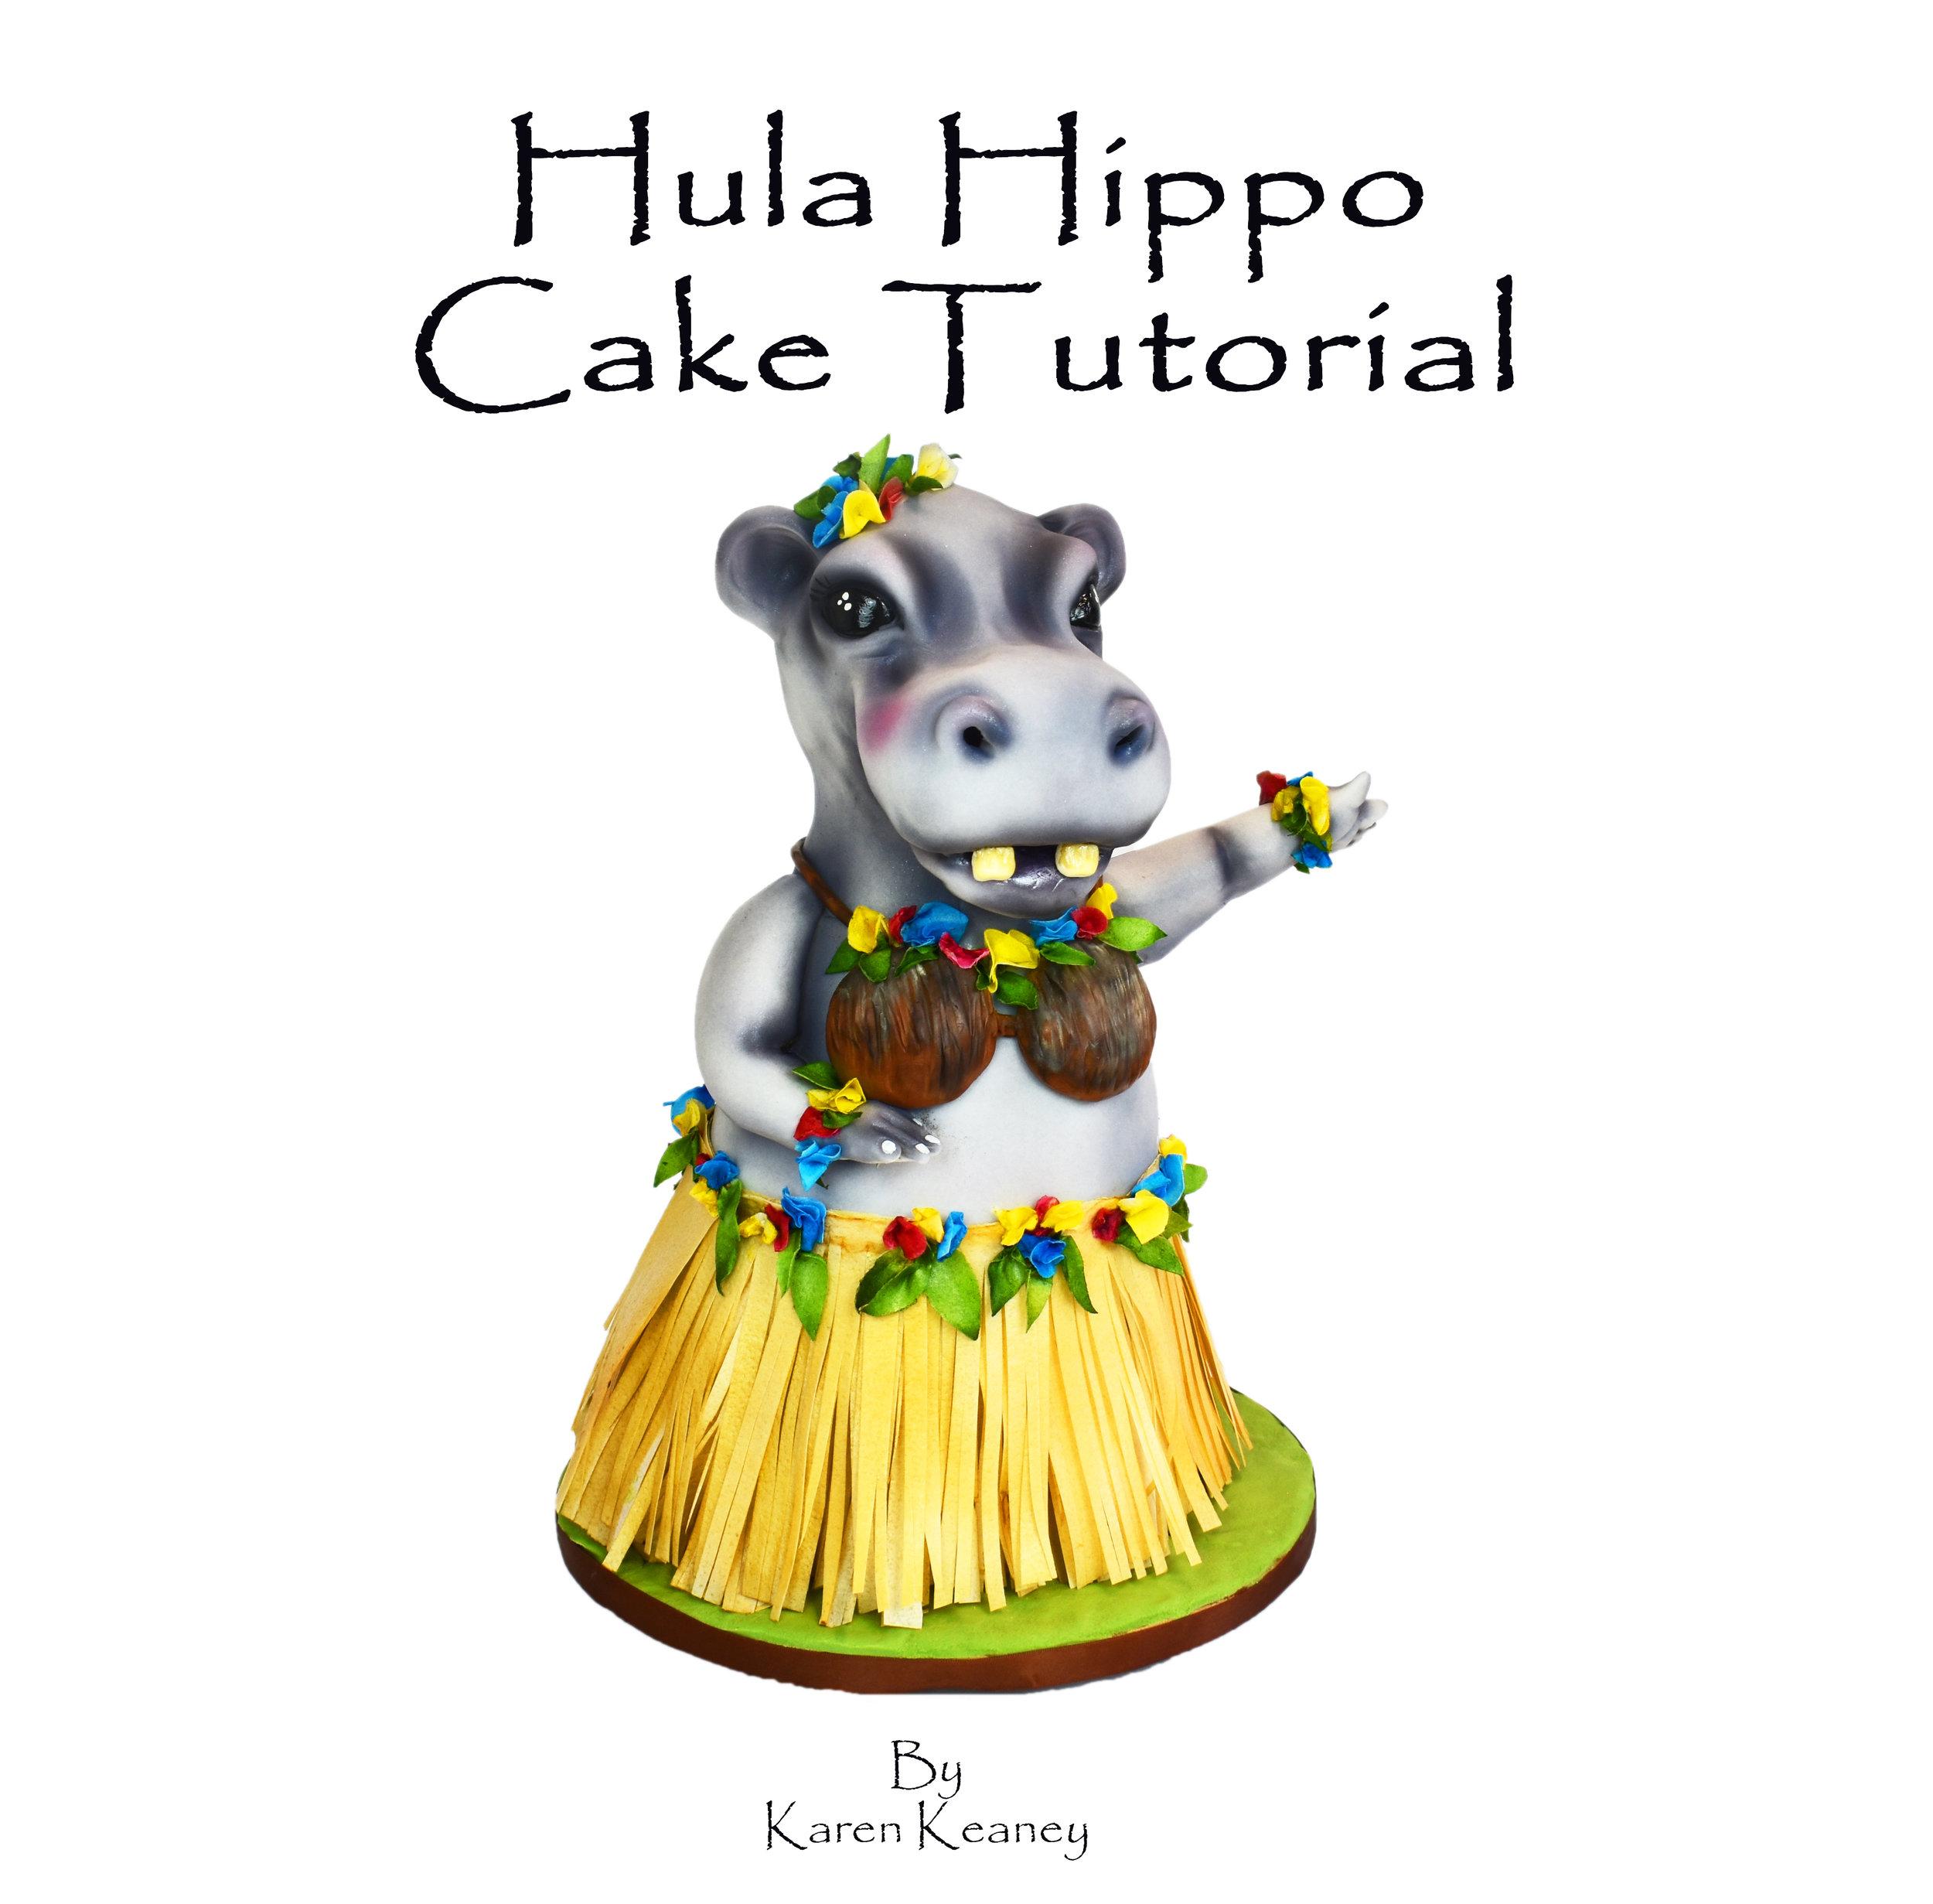 Hula Hippo Cake Tutorial